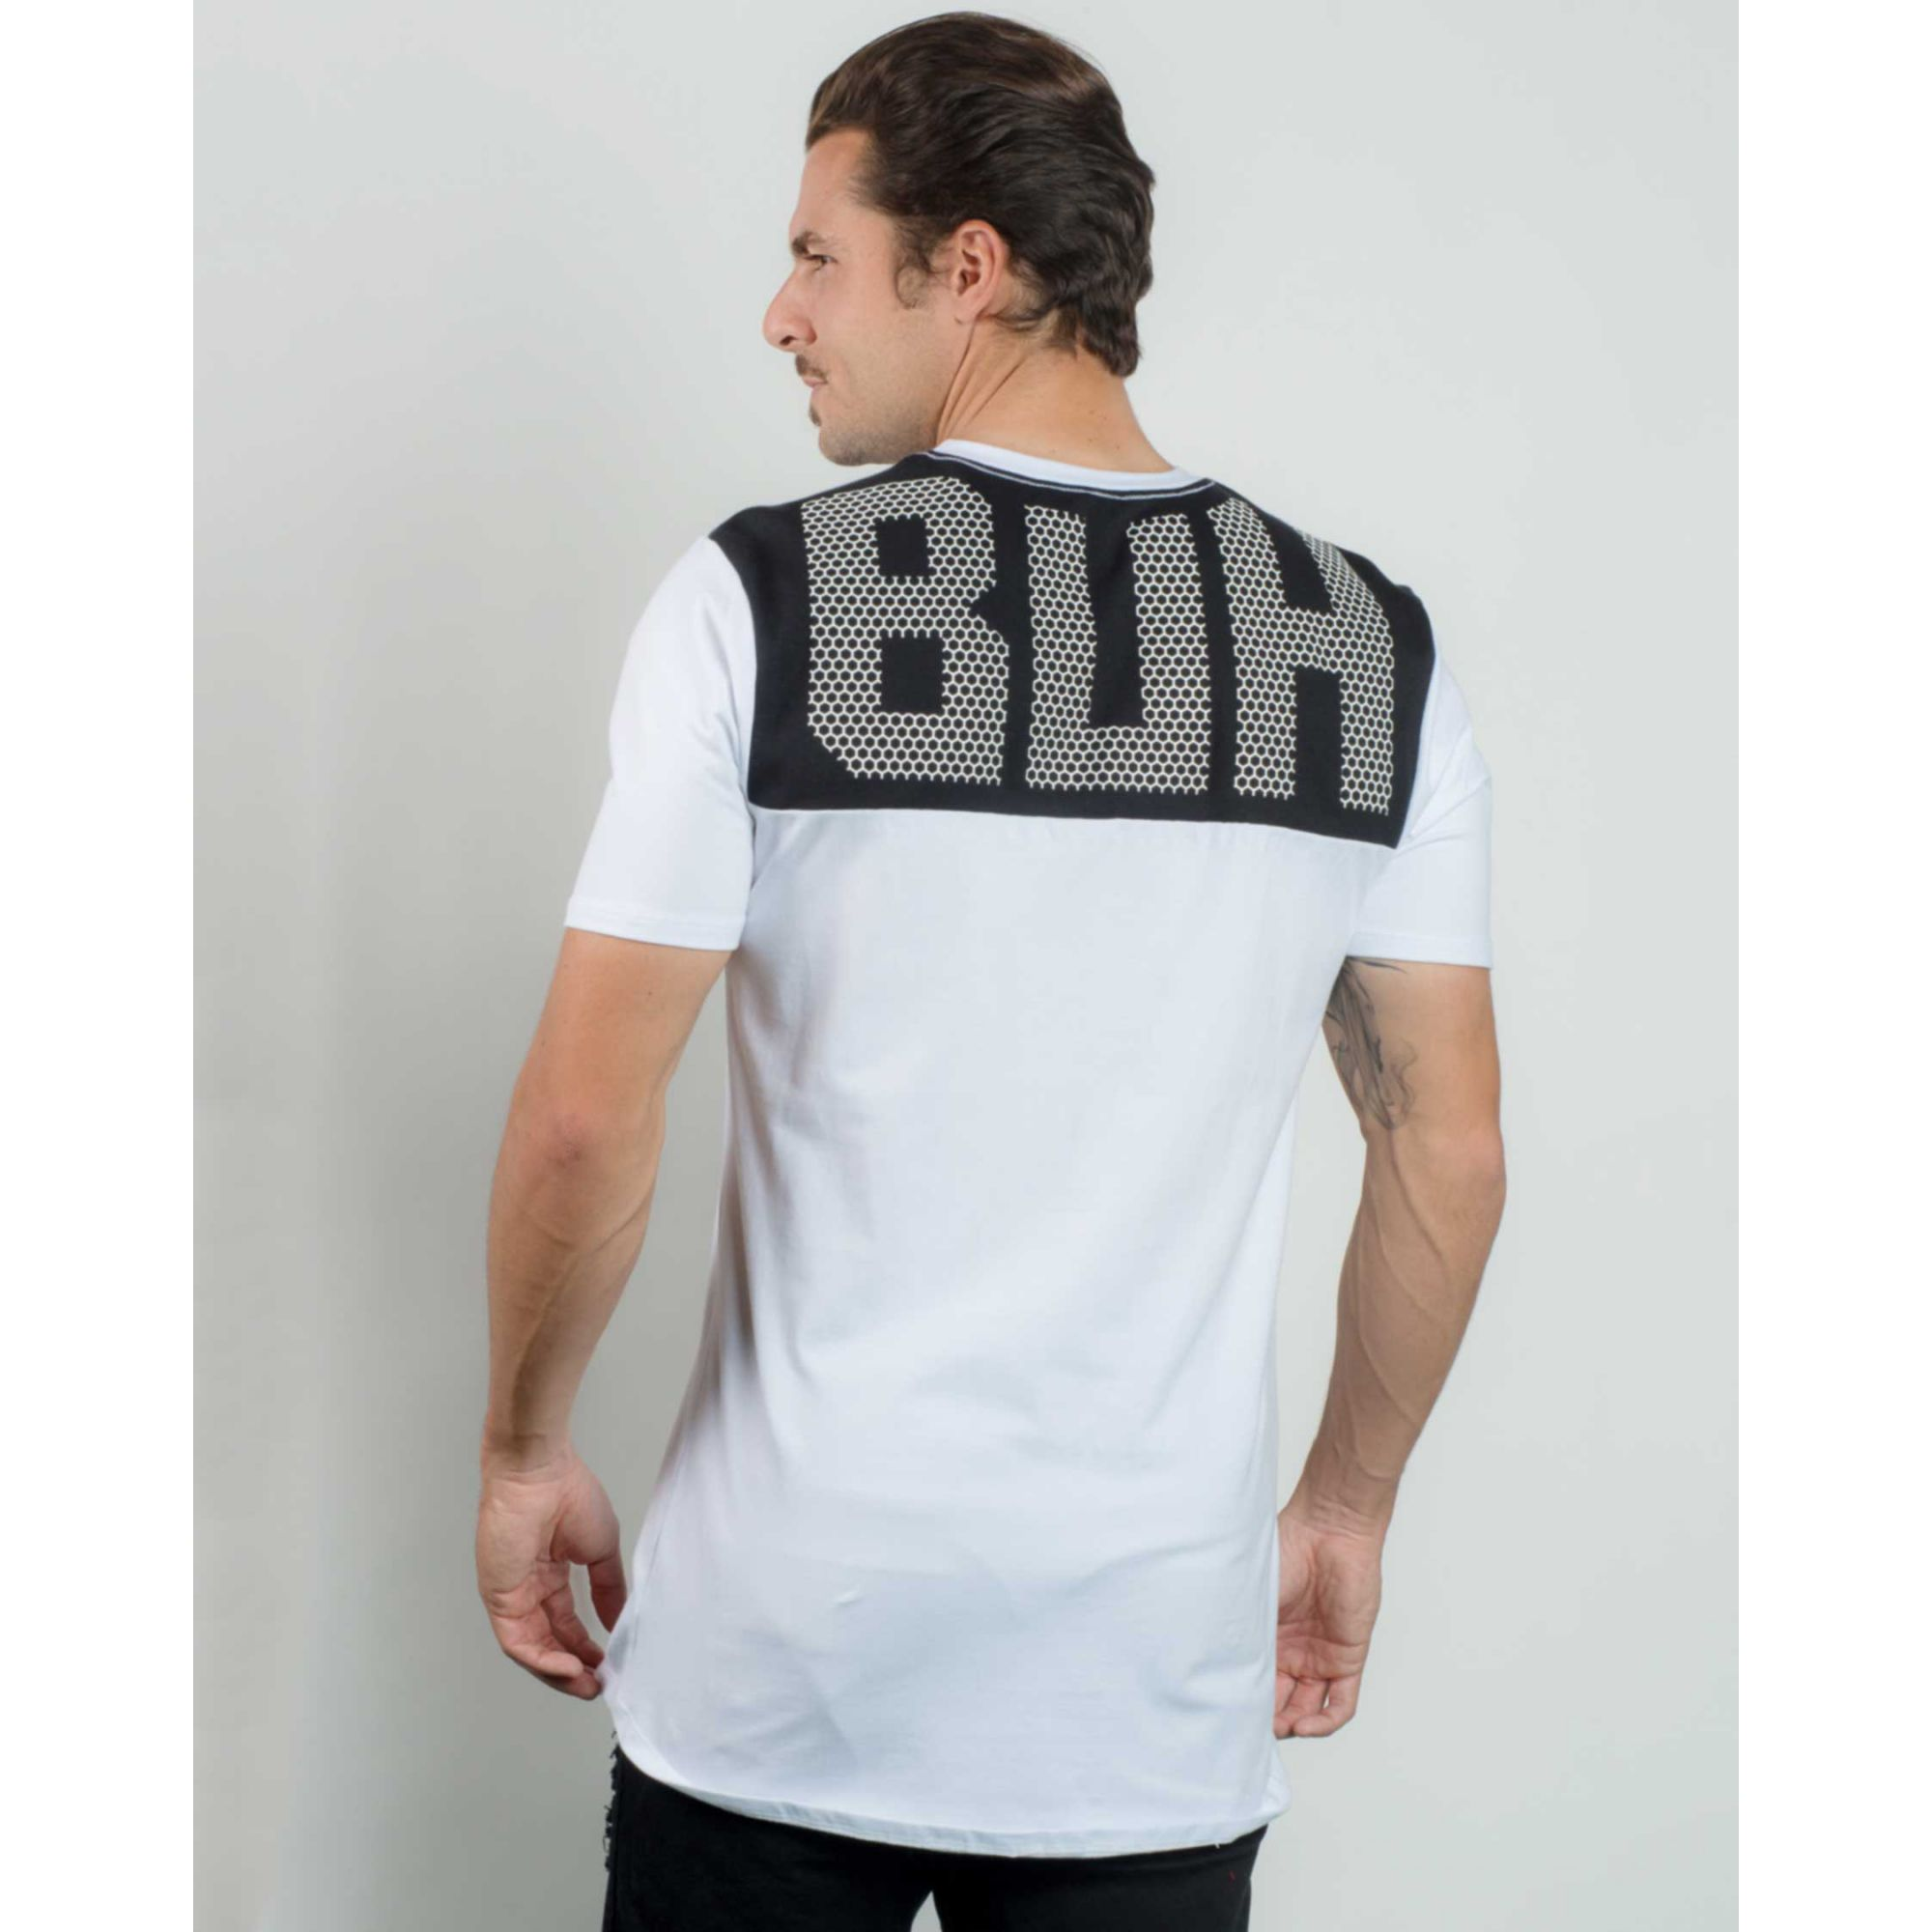 Camiseta Buh Back Mesh White & Black